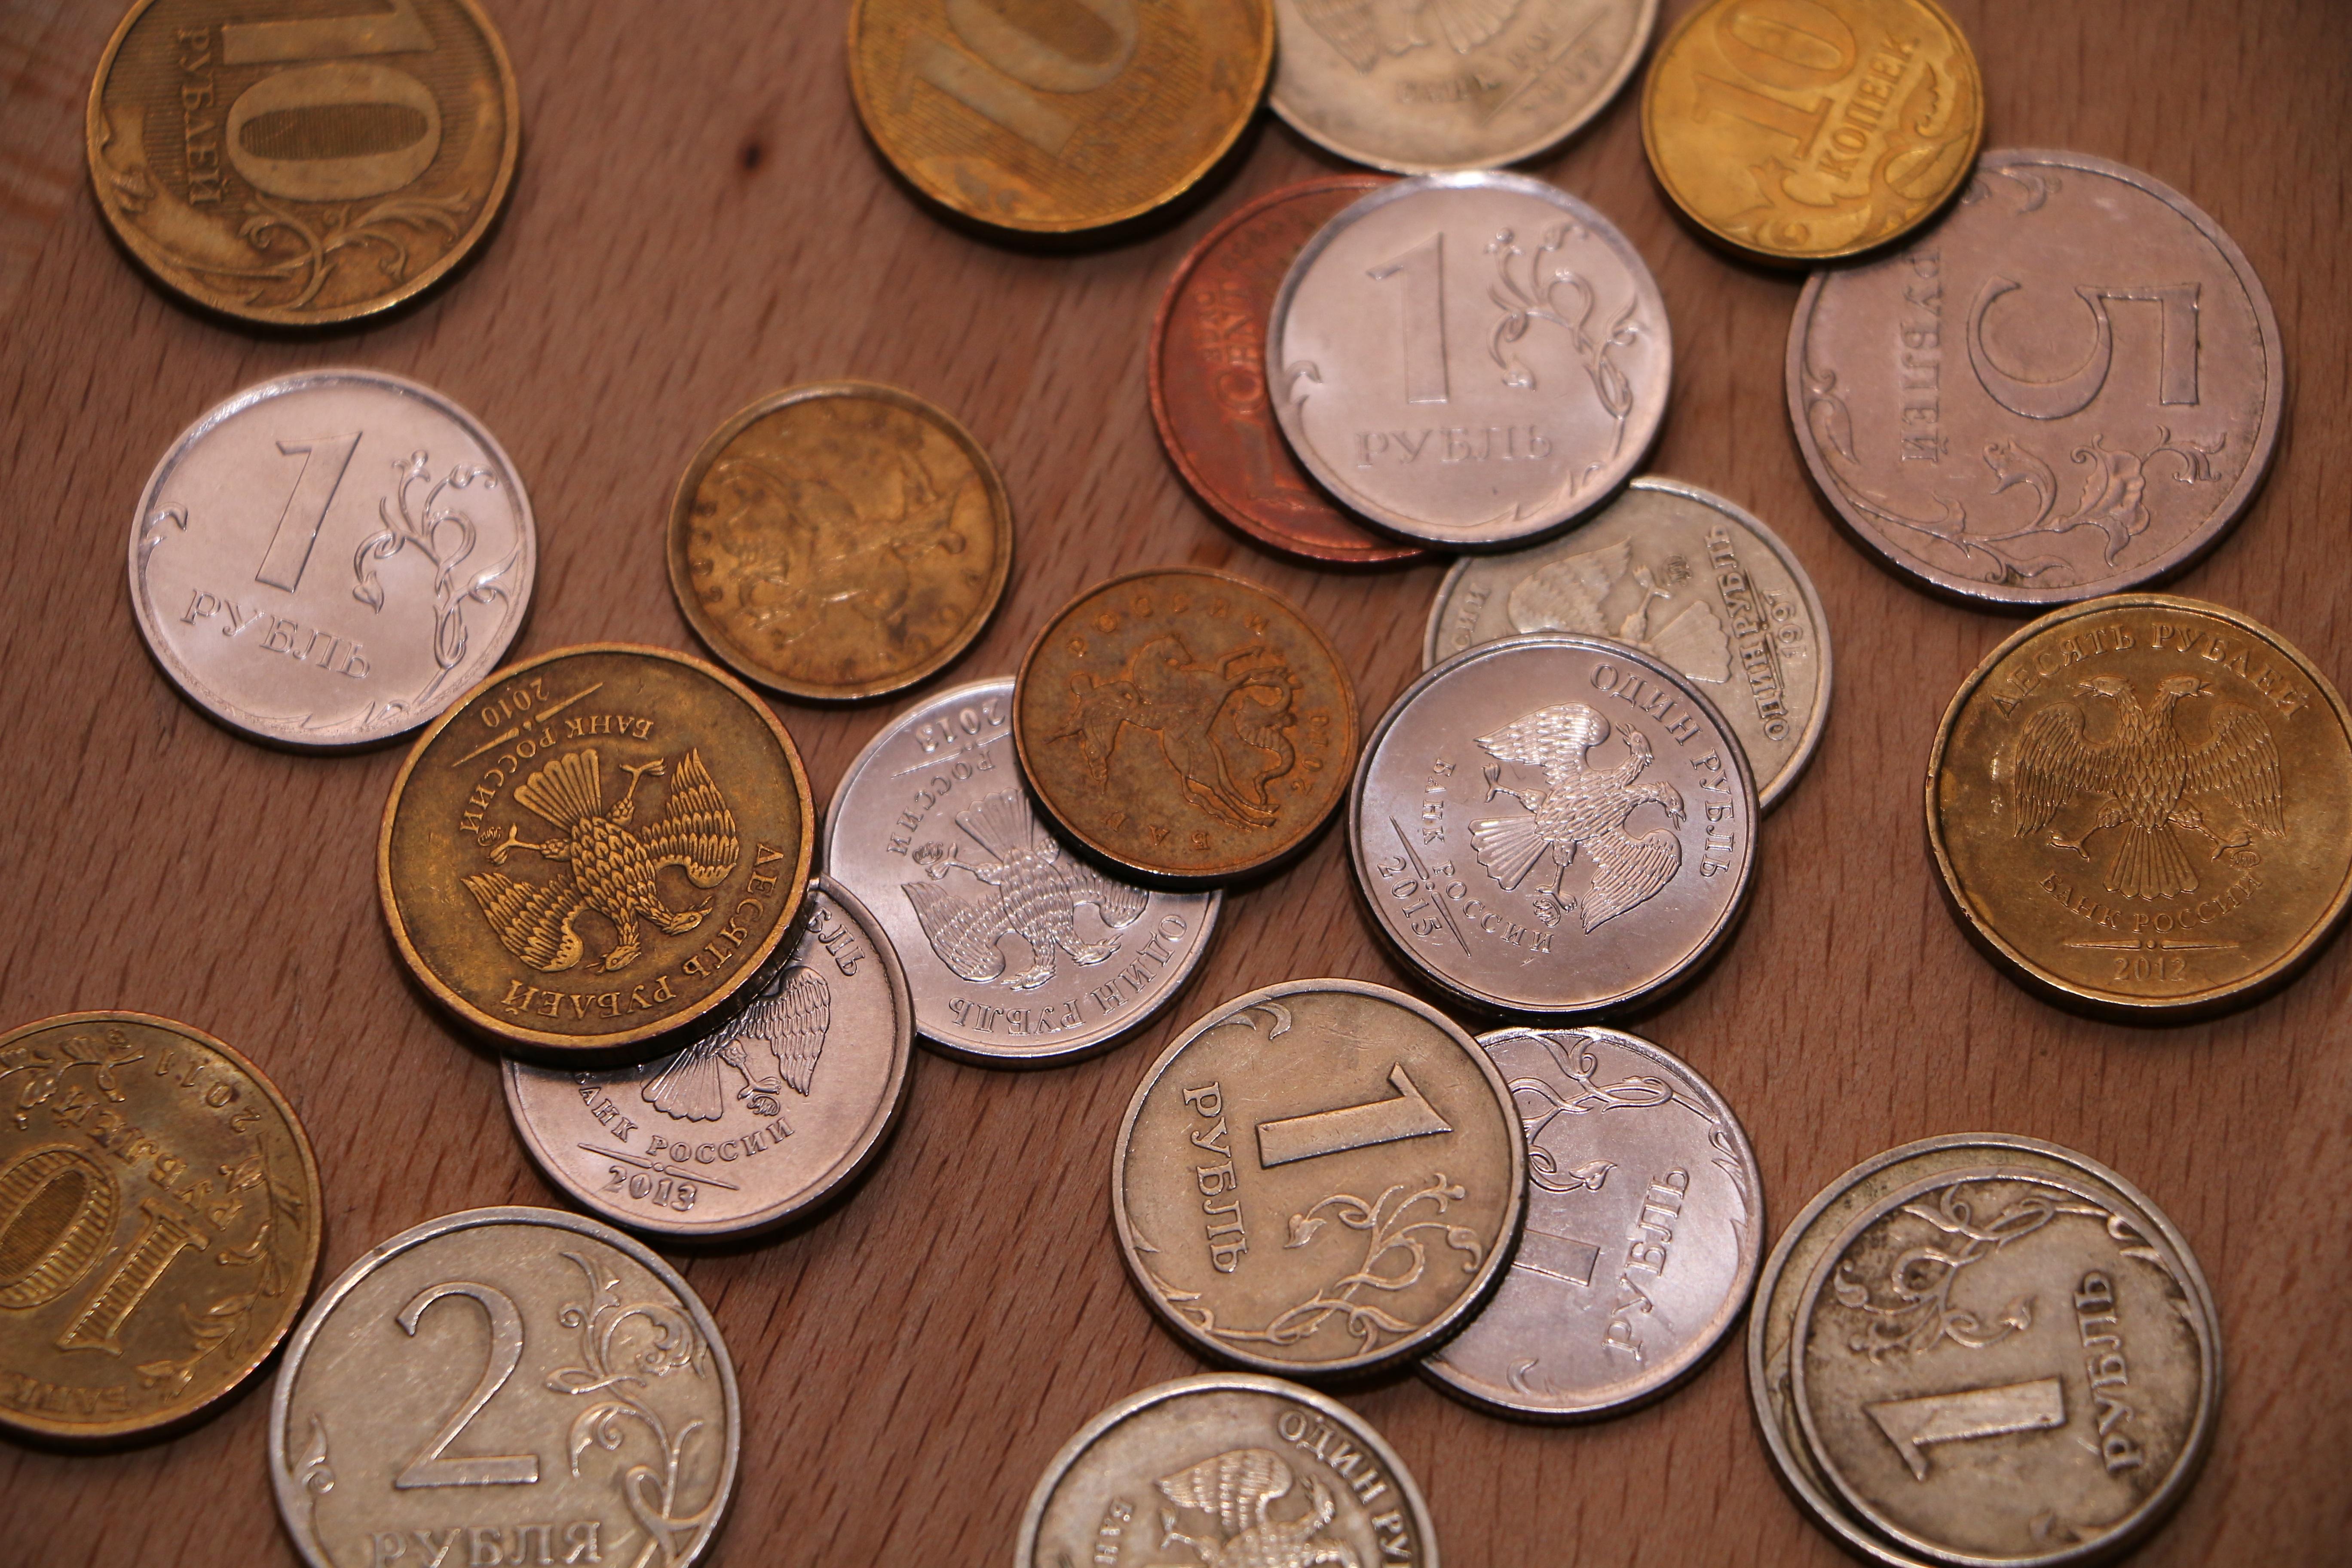 russland valuta